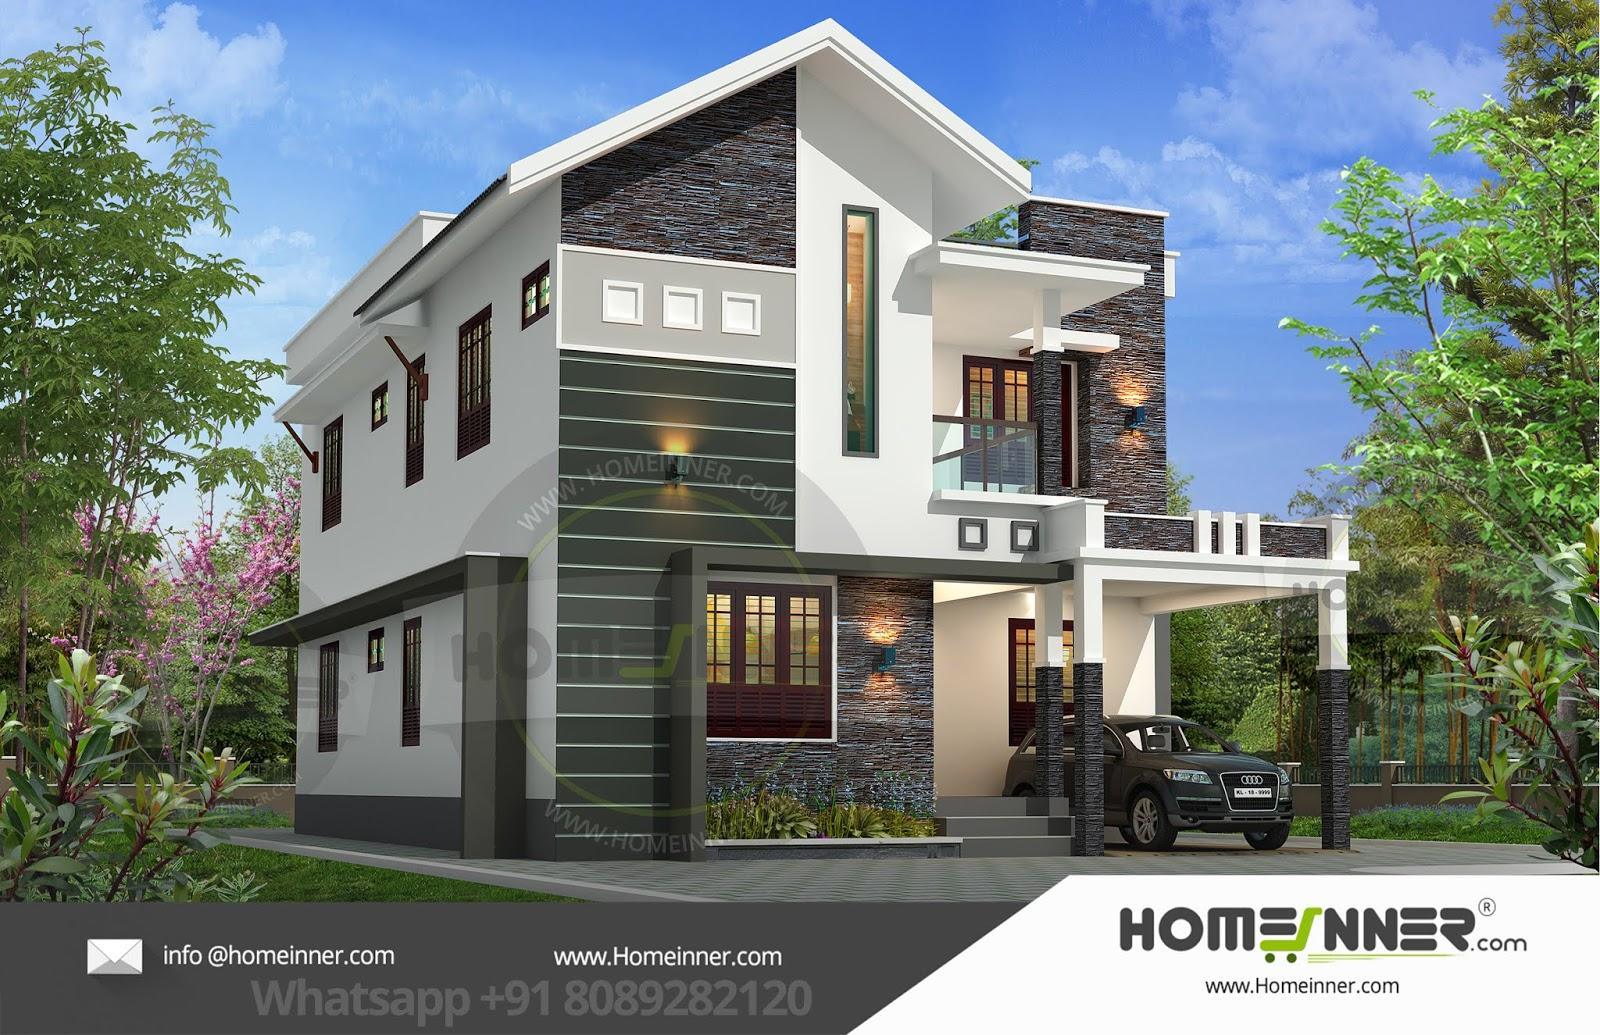 28 Lakh 3 BHK 2024 sq ft Chandigarh Villa